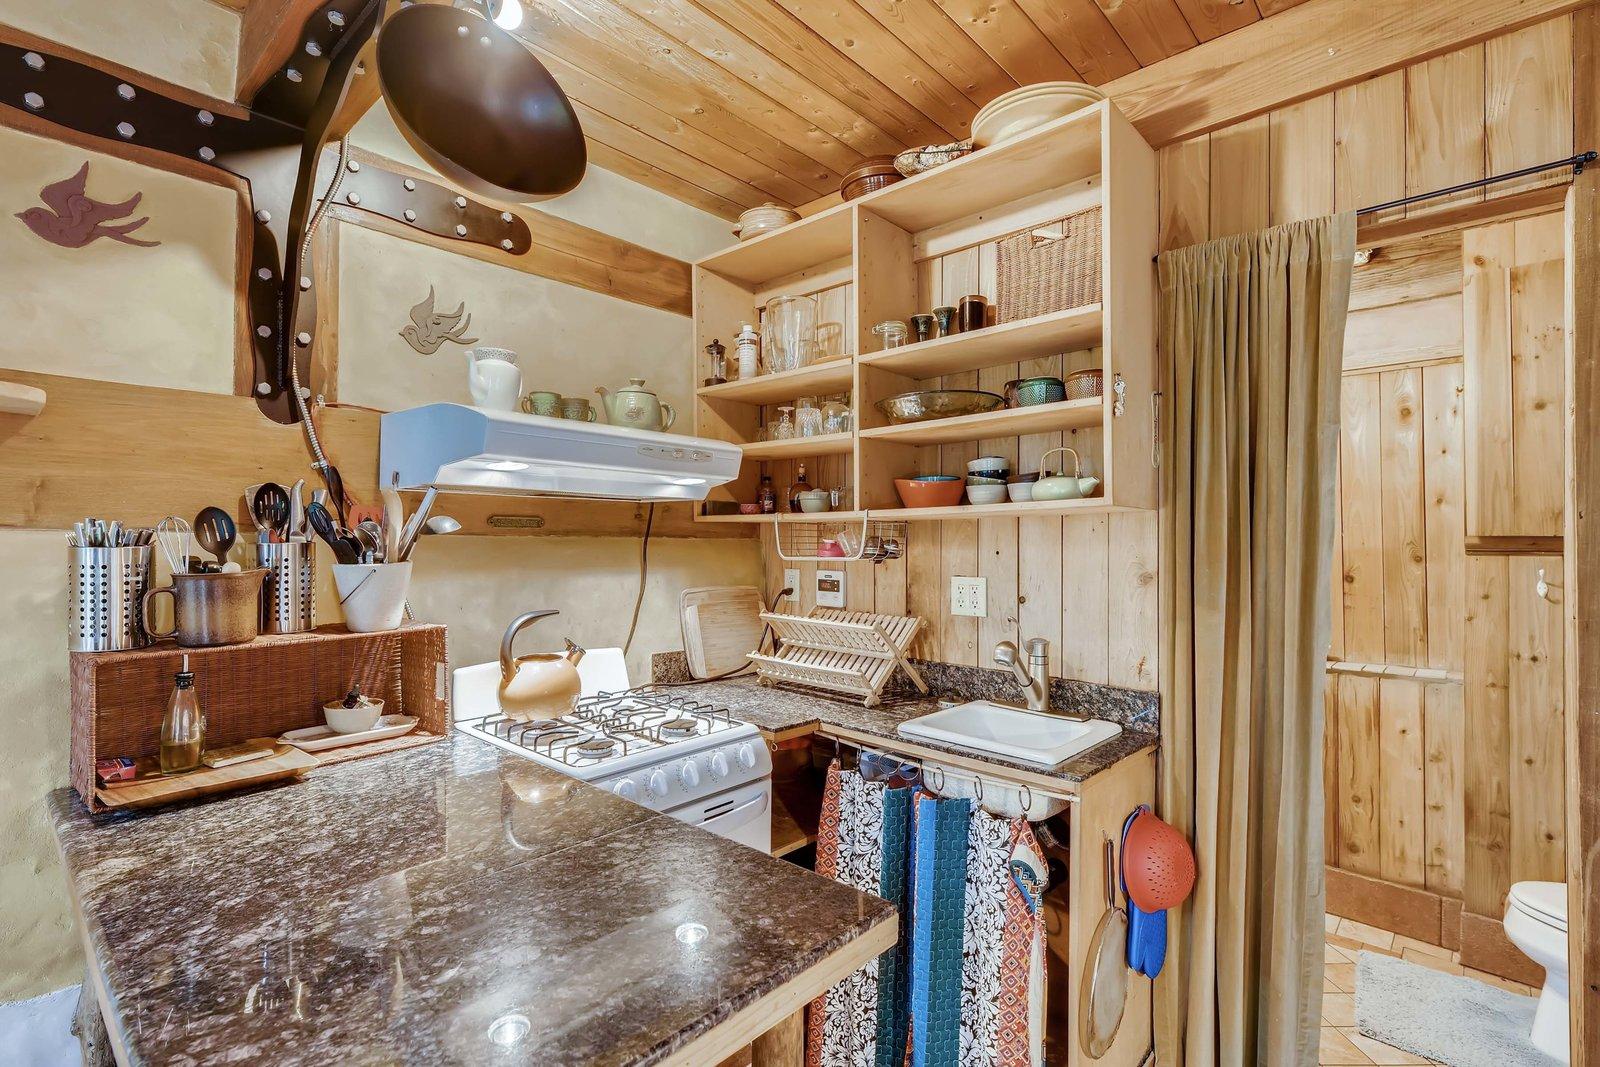 Sharingwood cob house kitchen